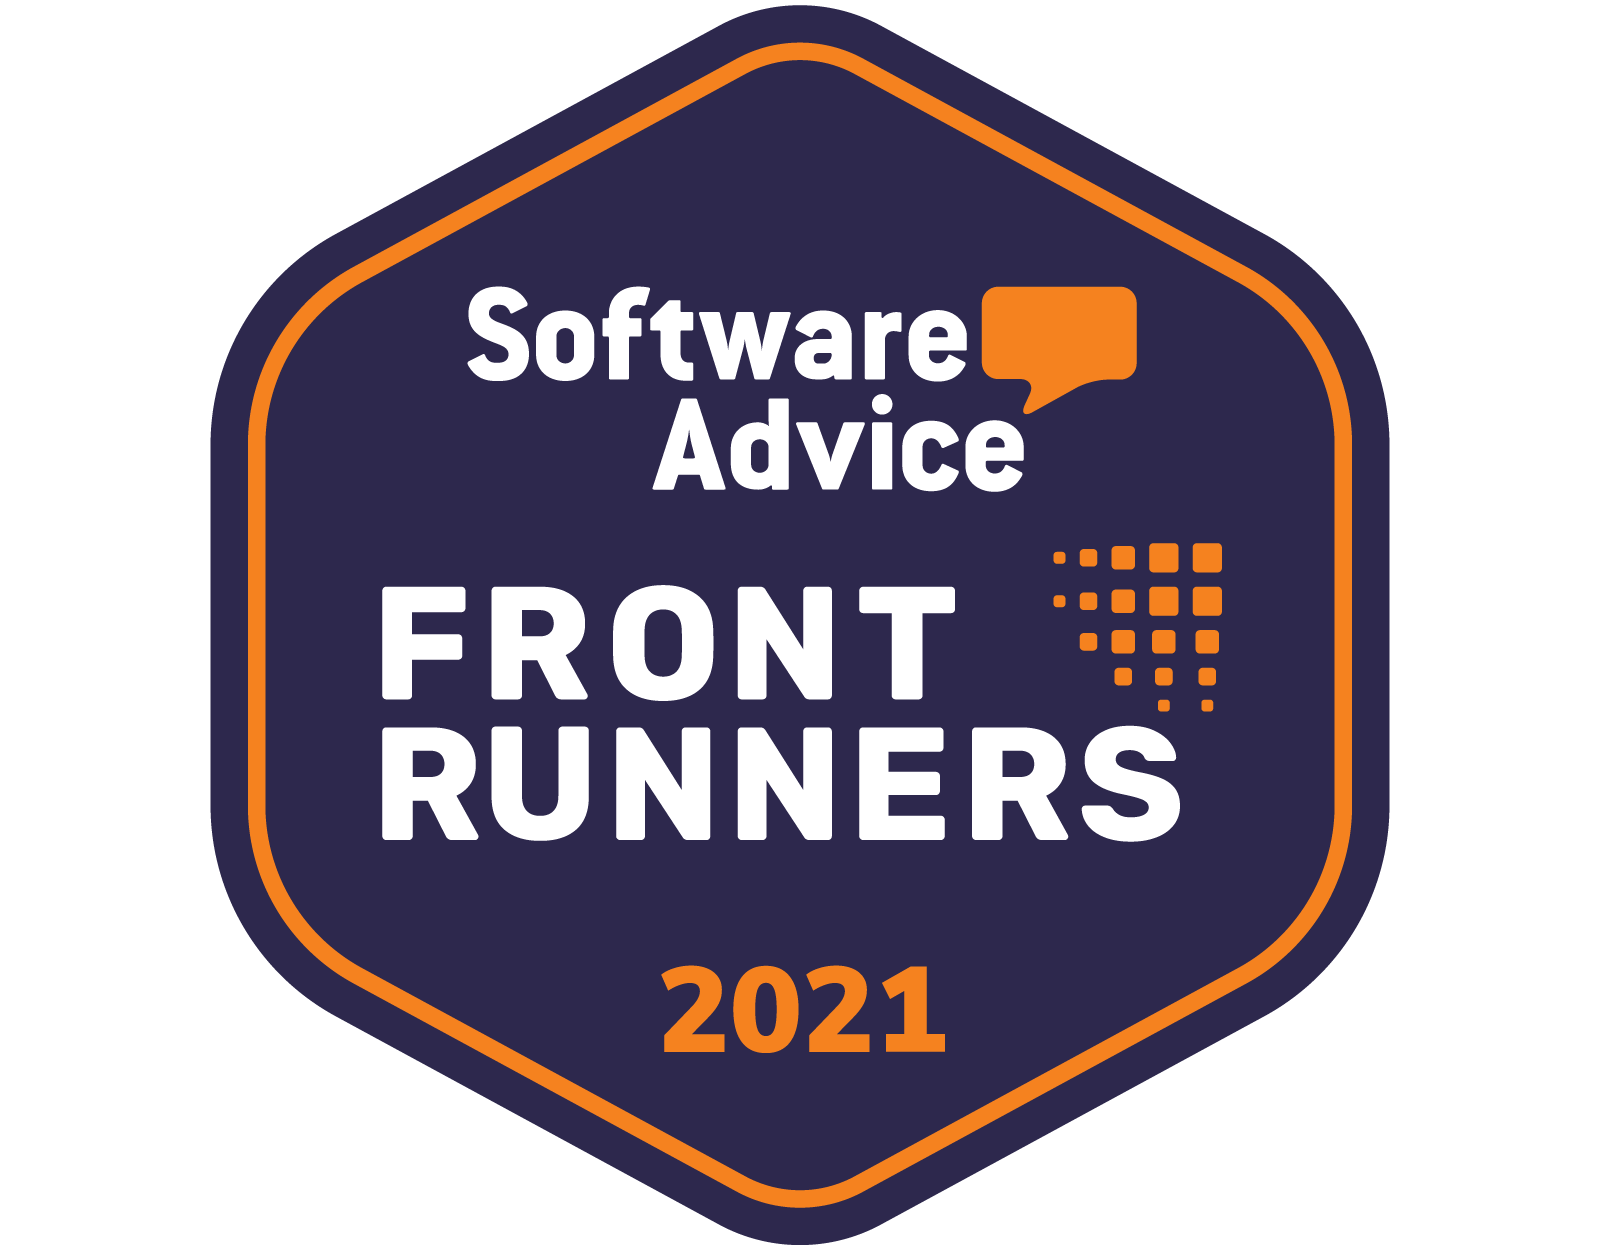 11Sight - Software Advice FrontRunner 2021